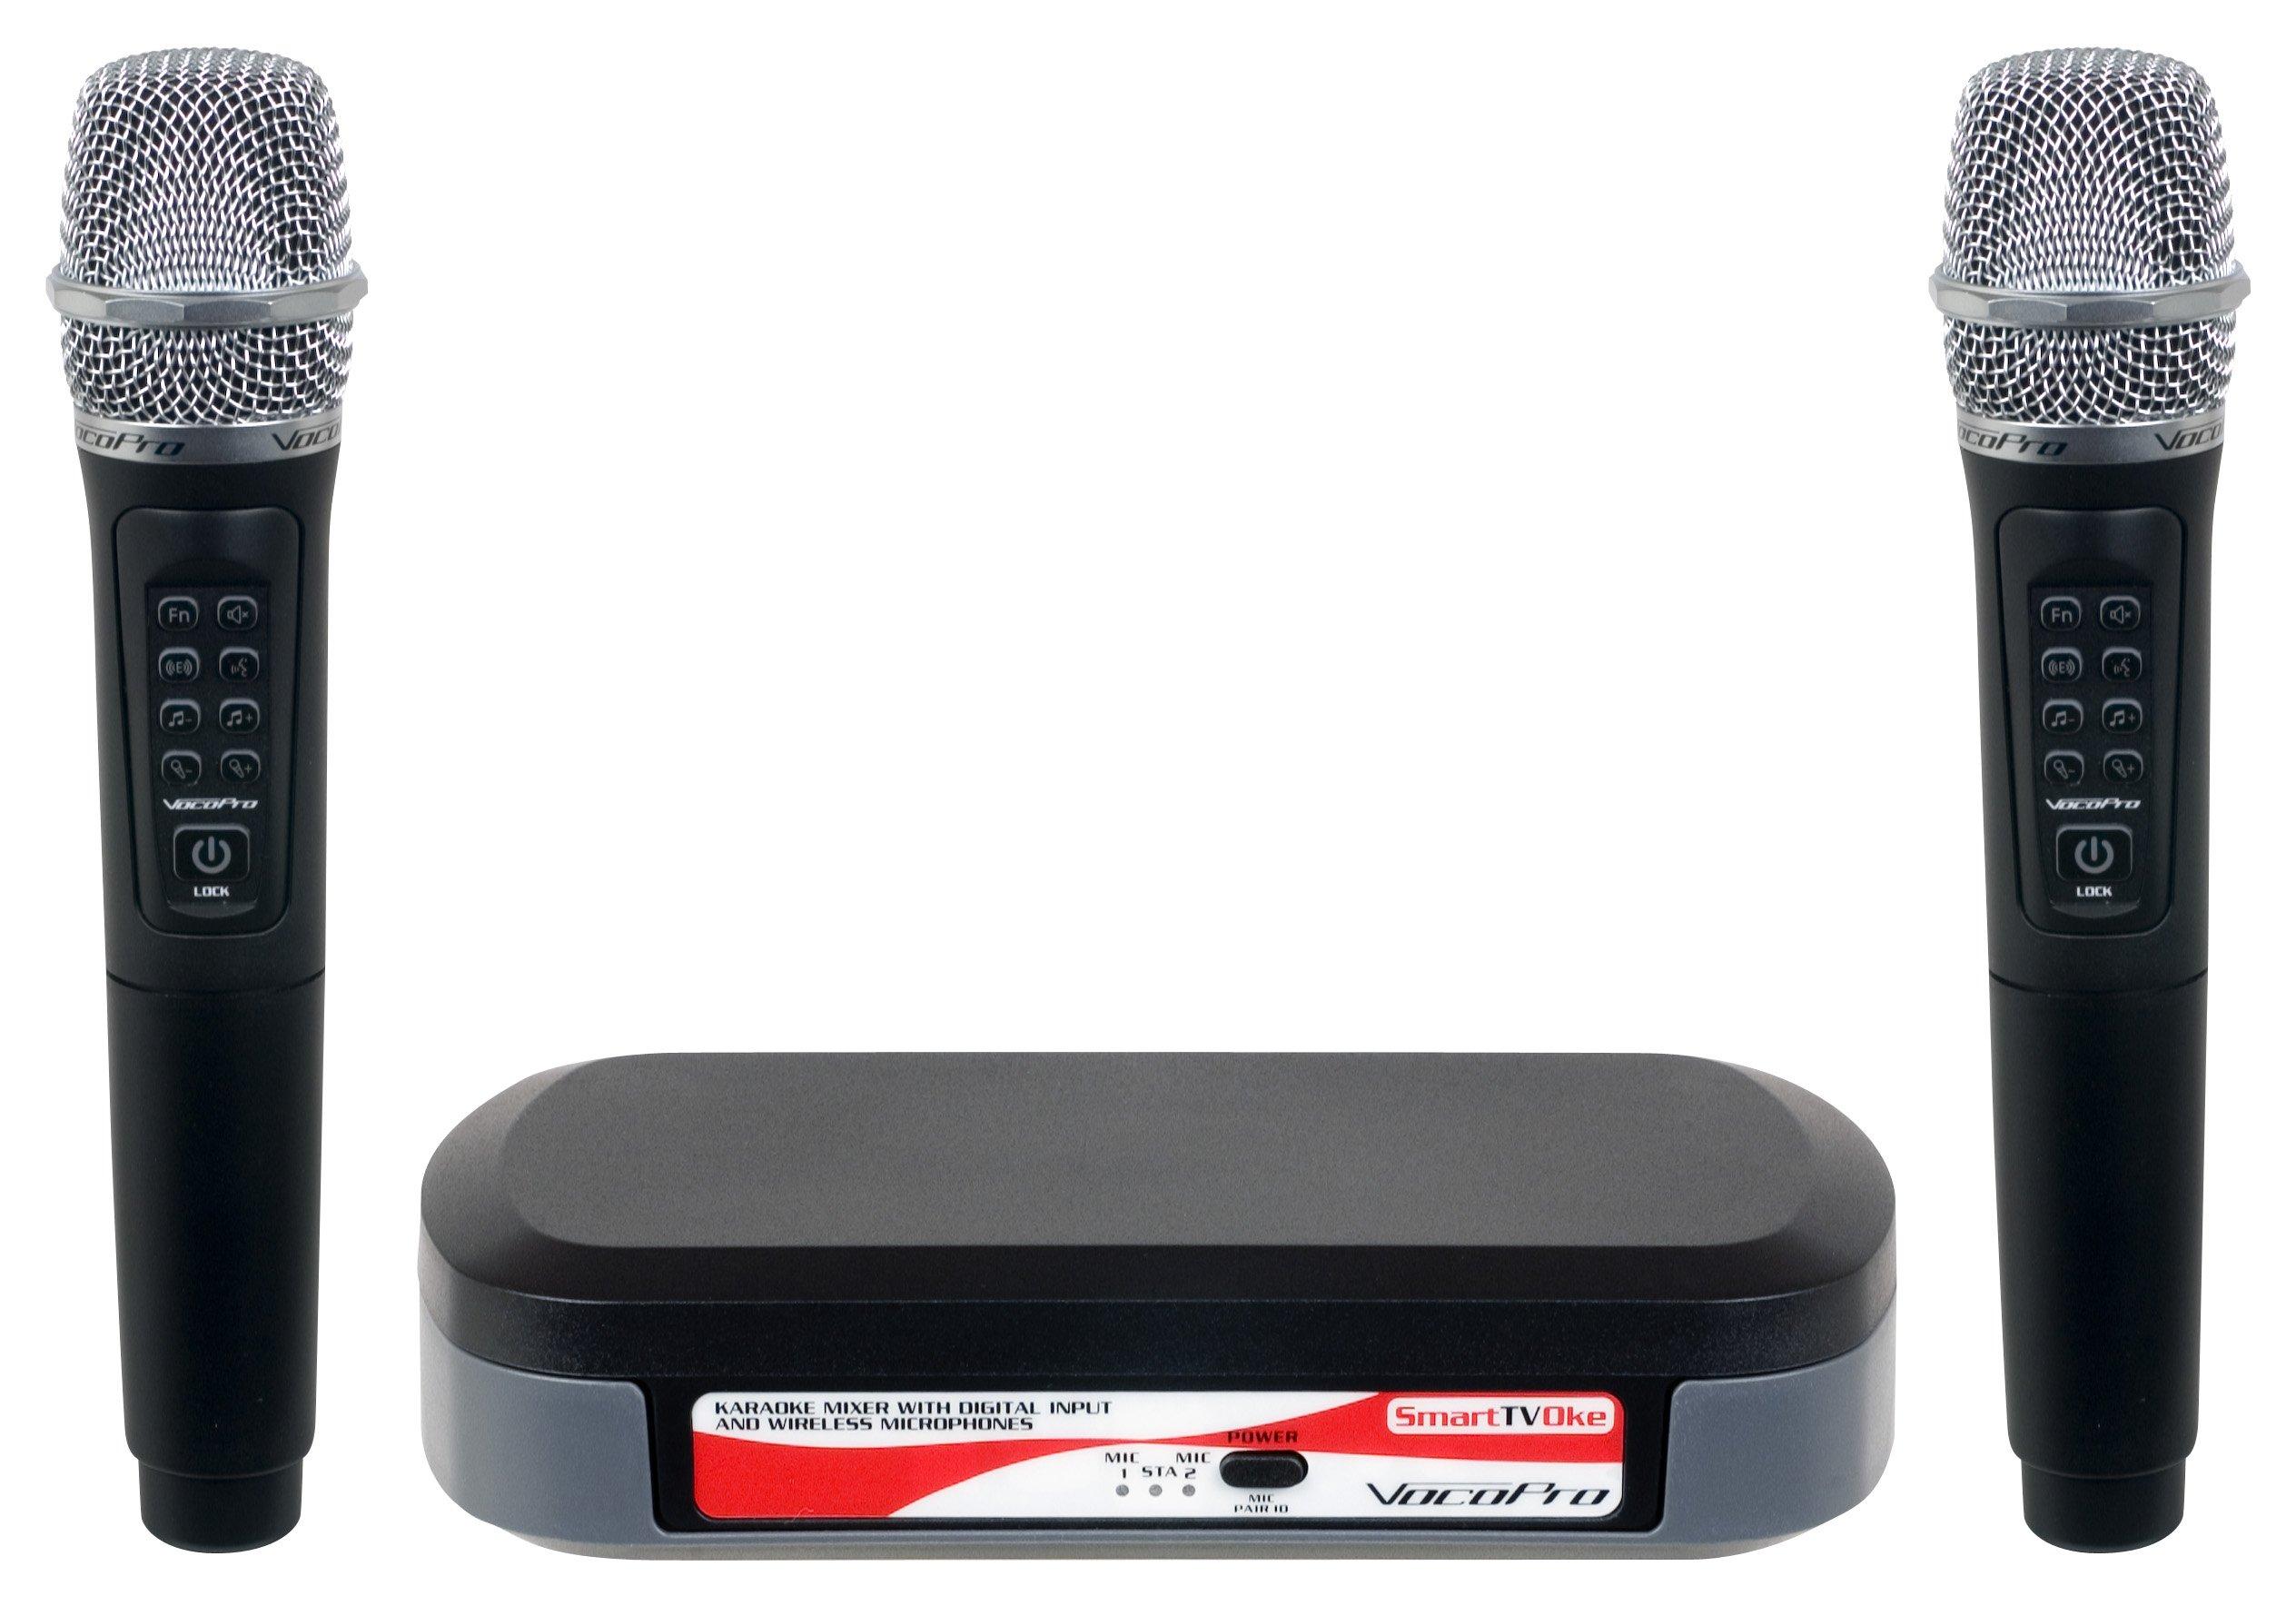 VOCOPRO SmartTVoke Karaoke System - Home